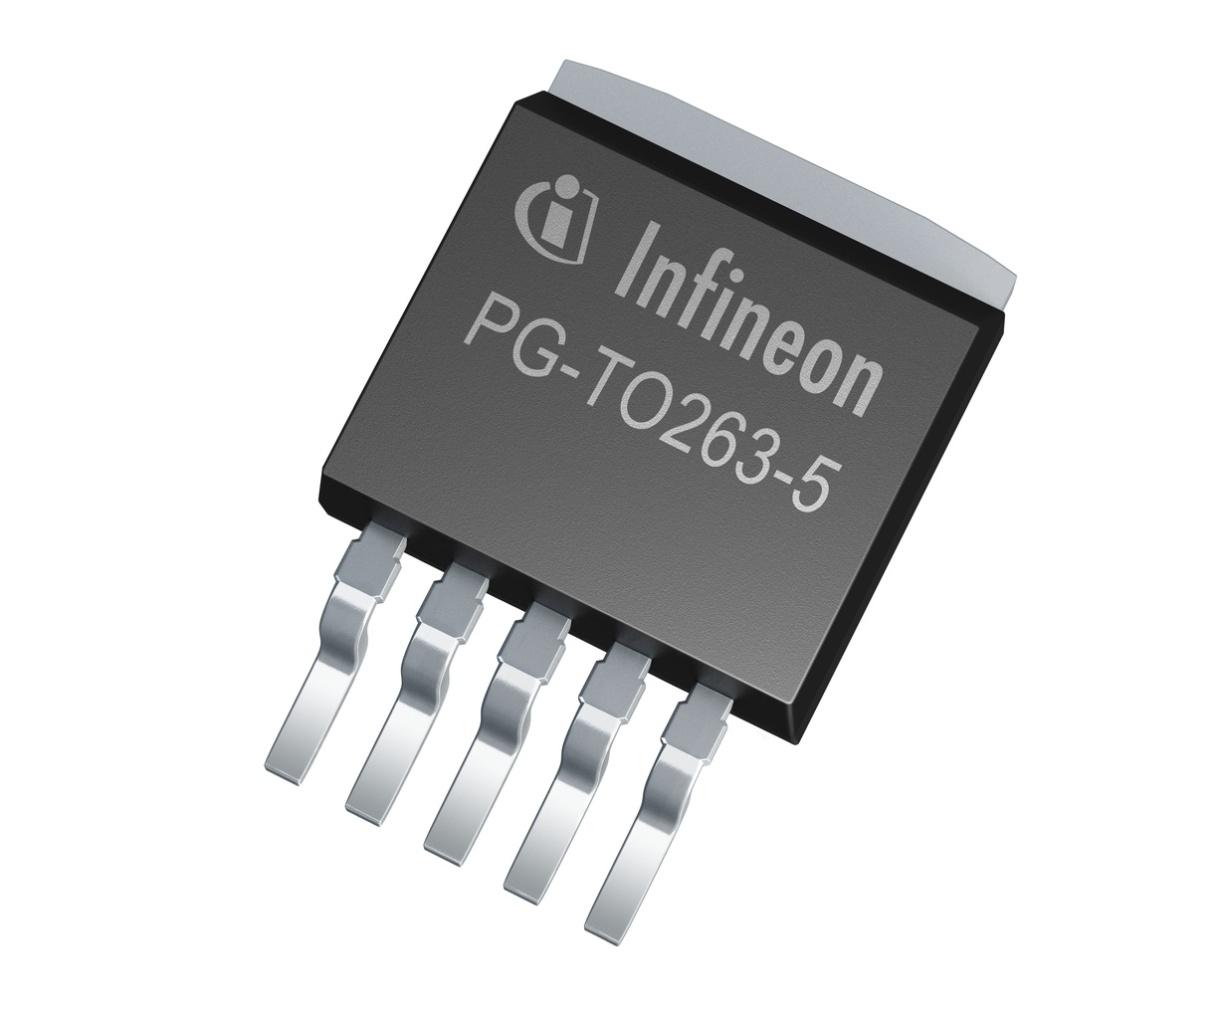 Tle4251g Infineon Technologies Linear Optocoupler Circuit Soft Start For 12 Volt Halogen Lamps 02 90 2016 20 Pdf 359 Kb